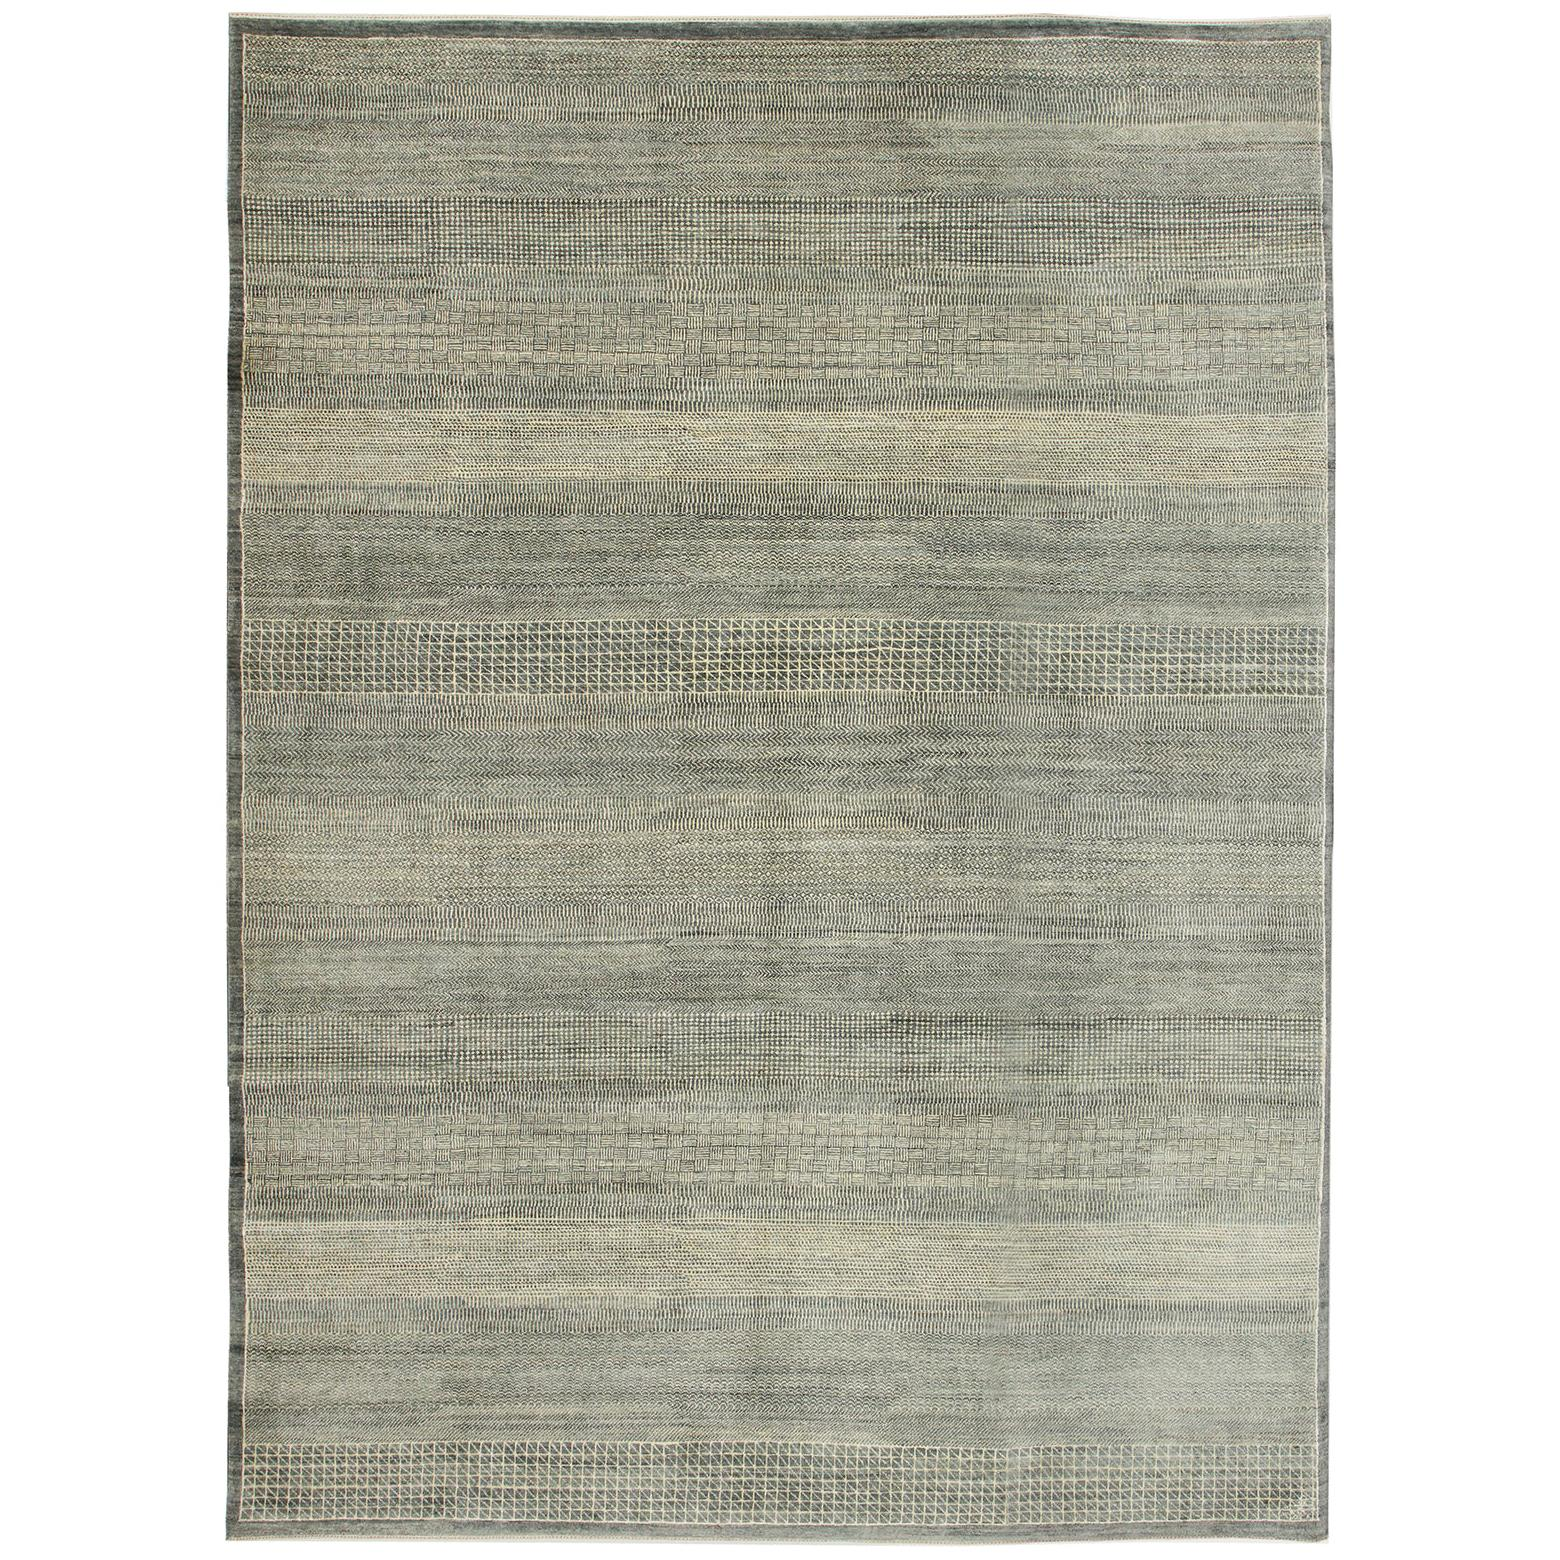 "Gray and Cream Minimalist Wool Persian Carpet, ""Rain"" Collection"